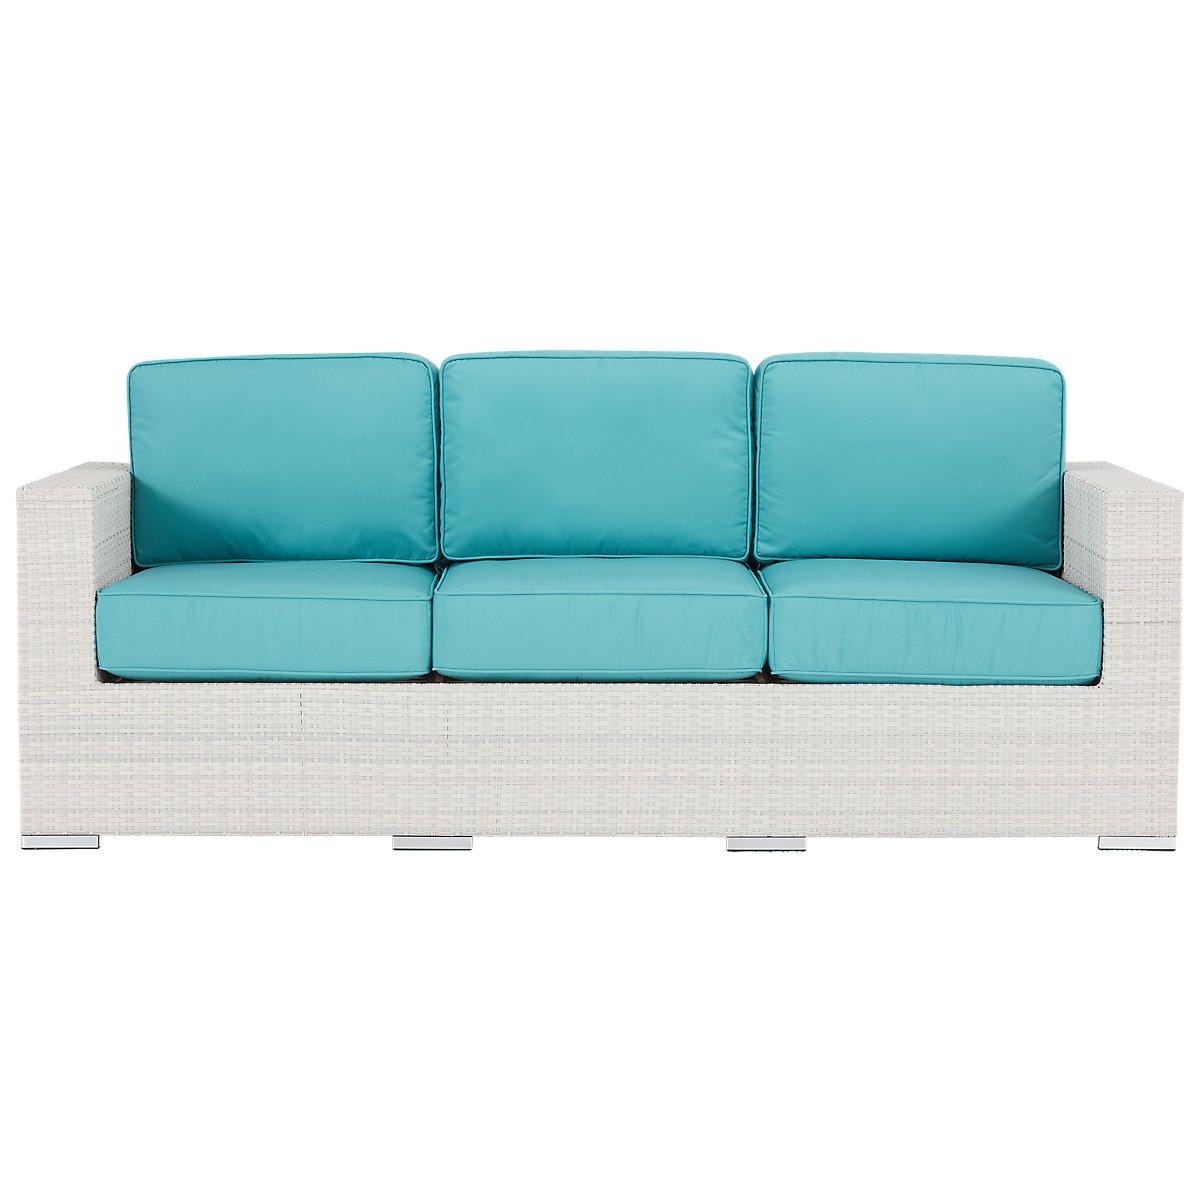 City furniture biscayne dark teal sofa for Teal sofas for sale